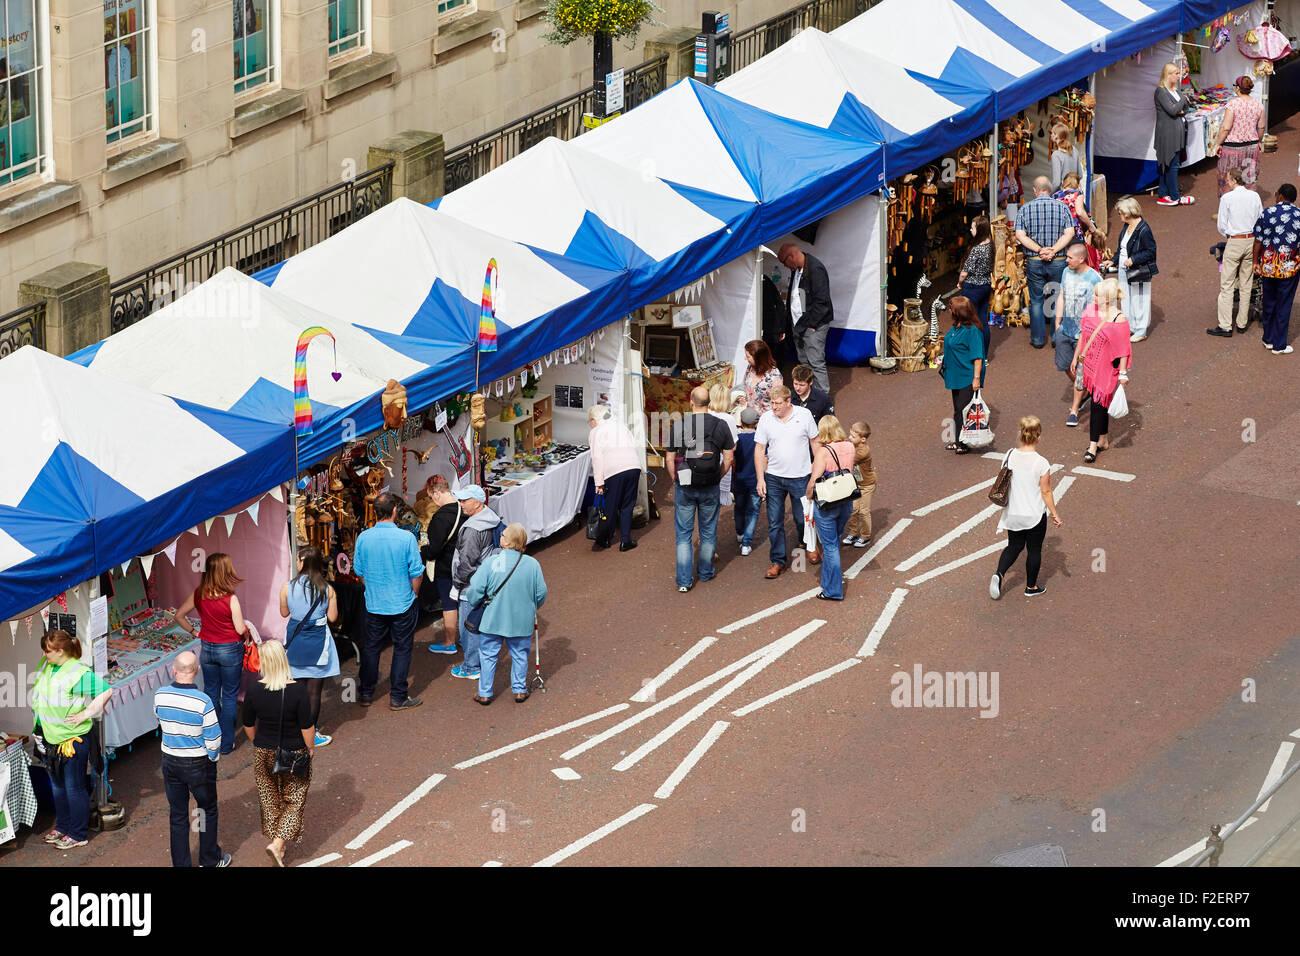 Stockport Food Festival